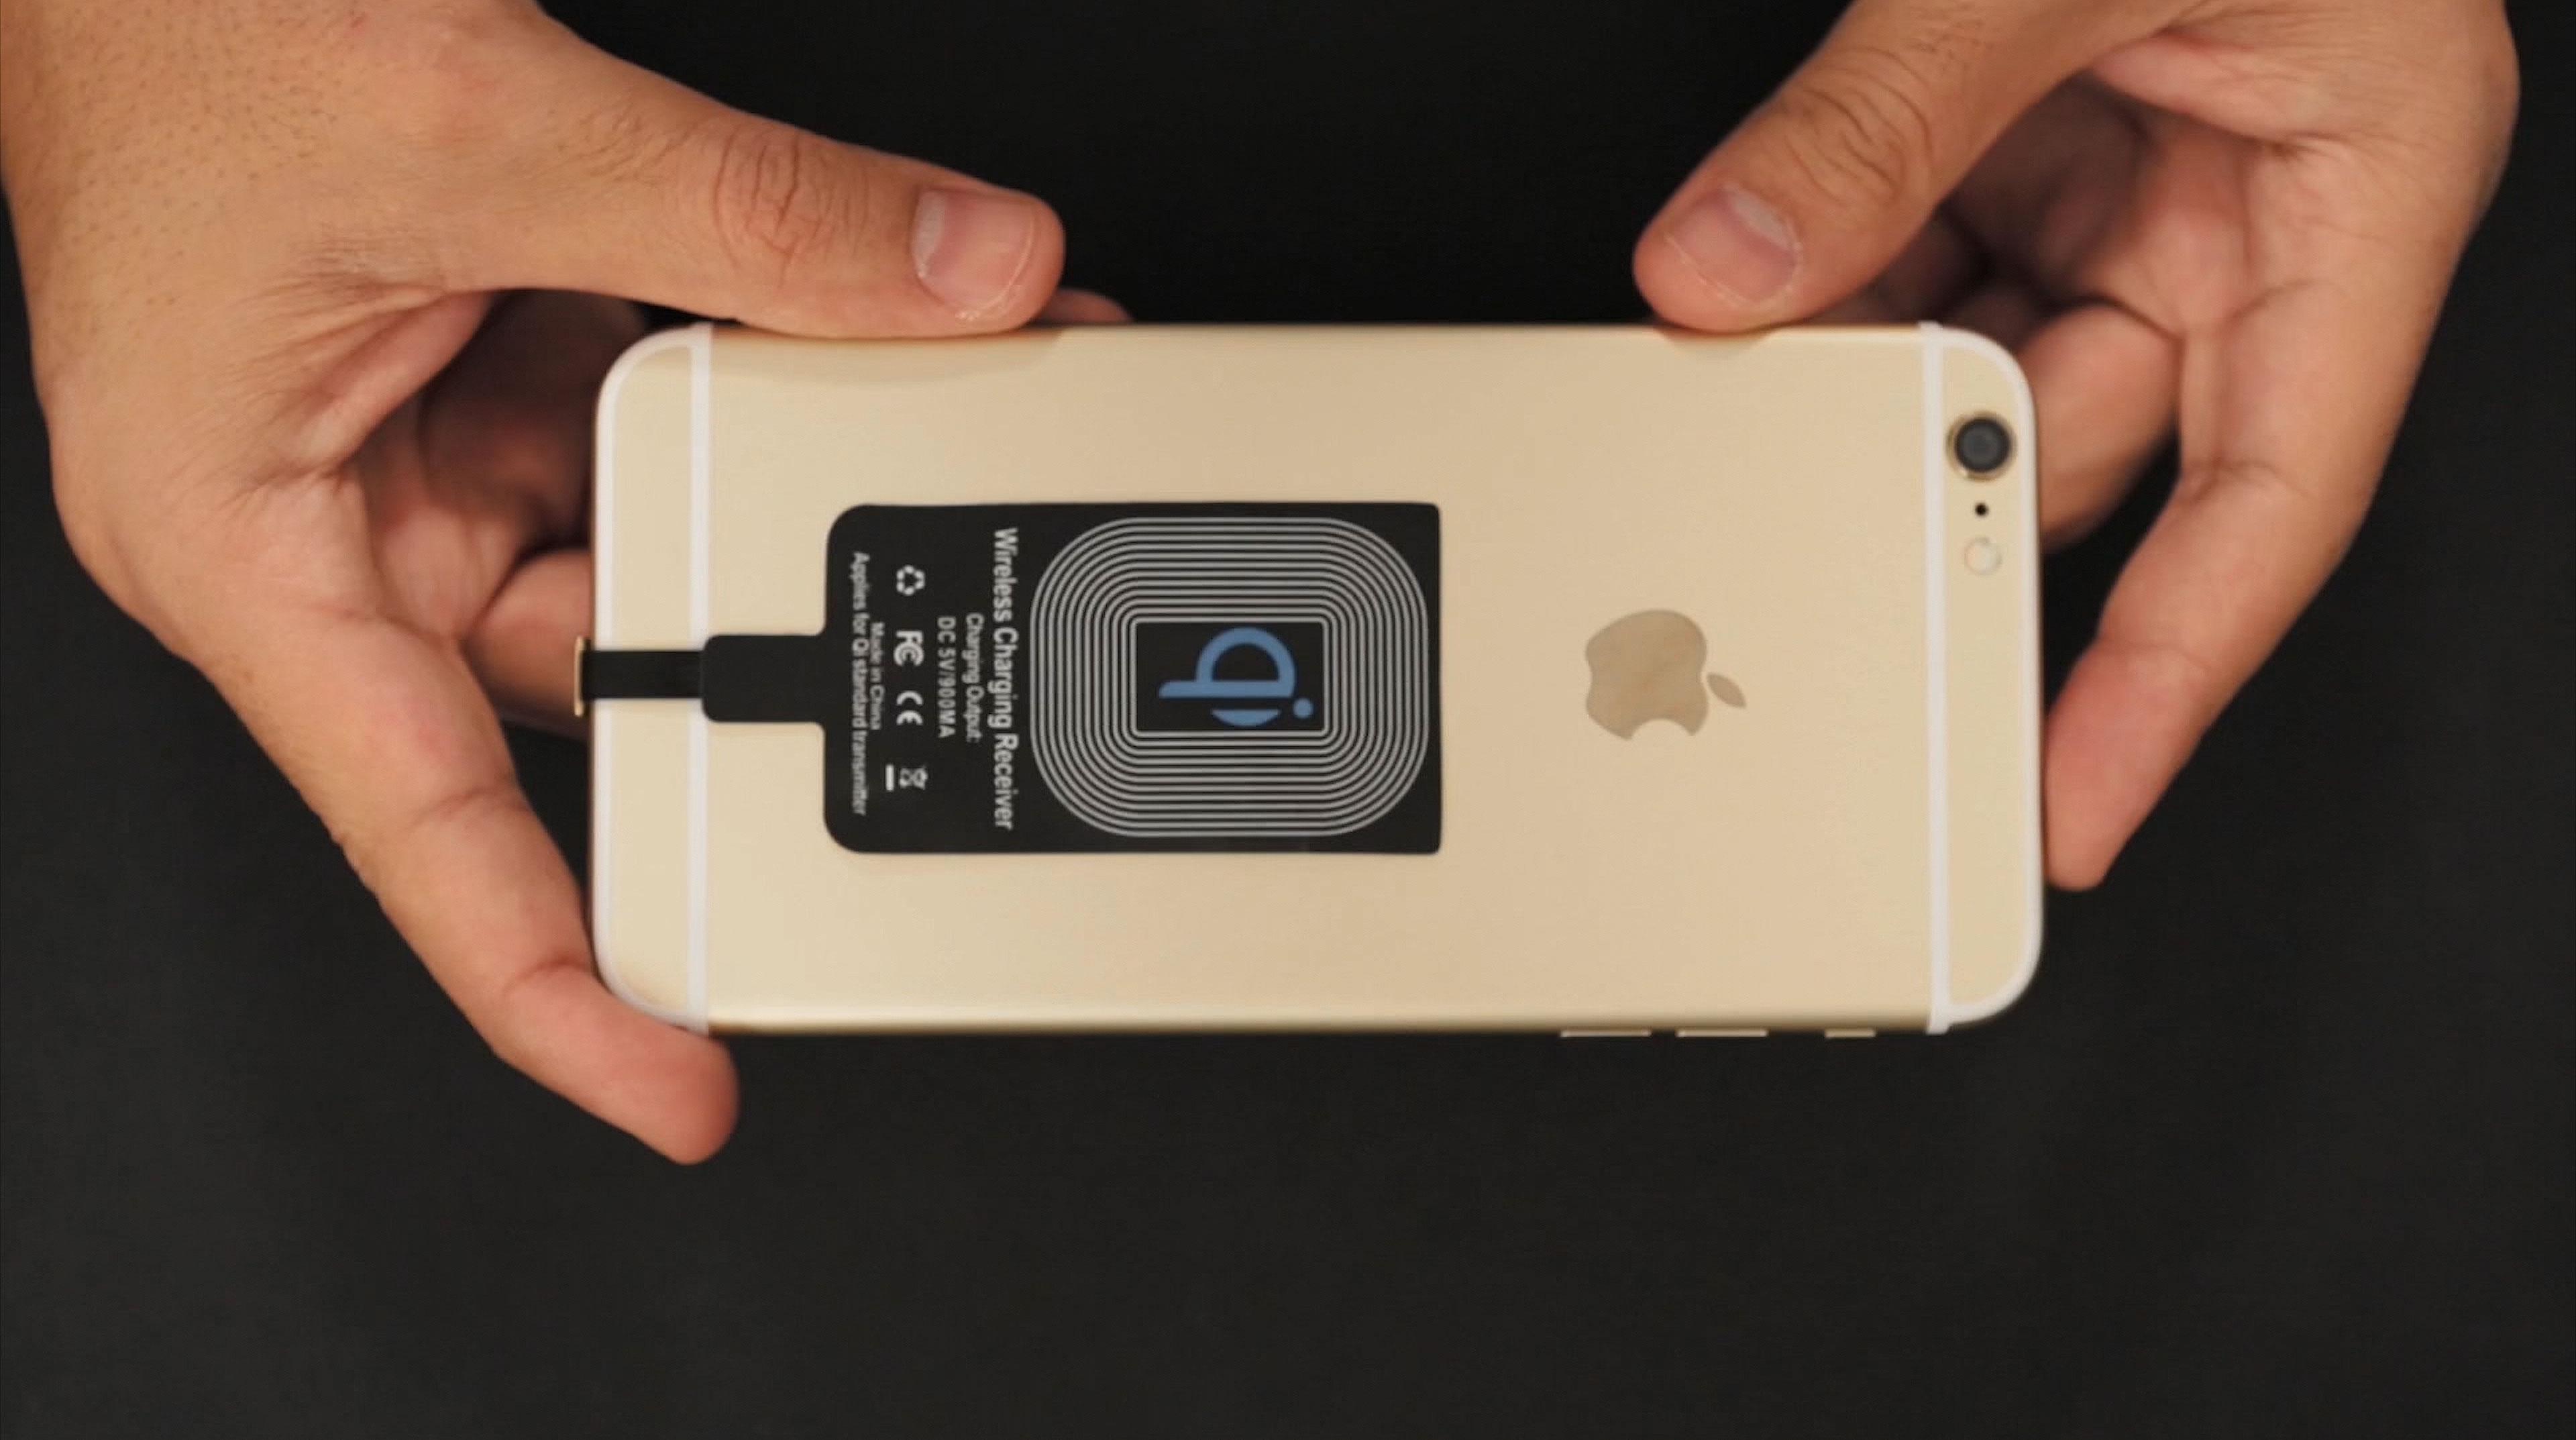 3d_printing_qi-reciver-iphone.jpg